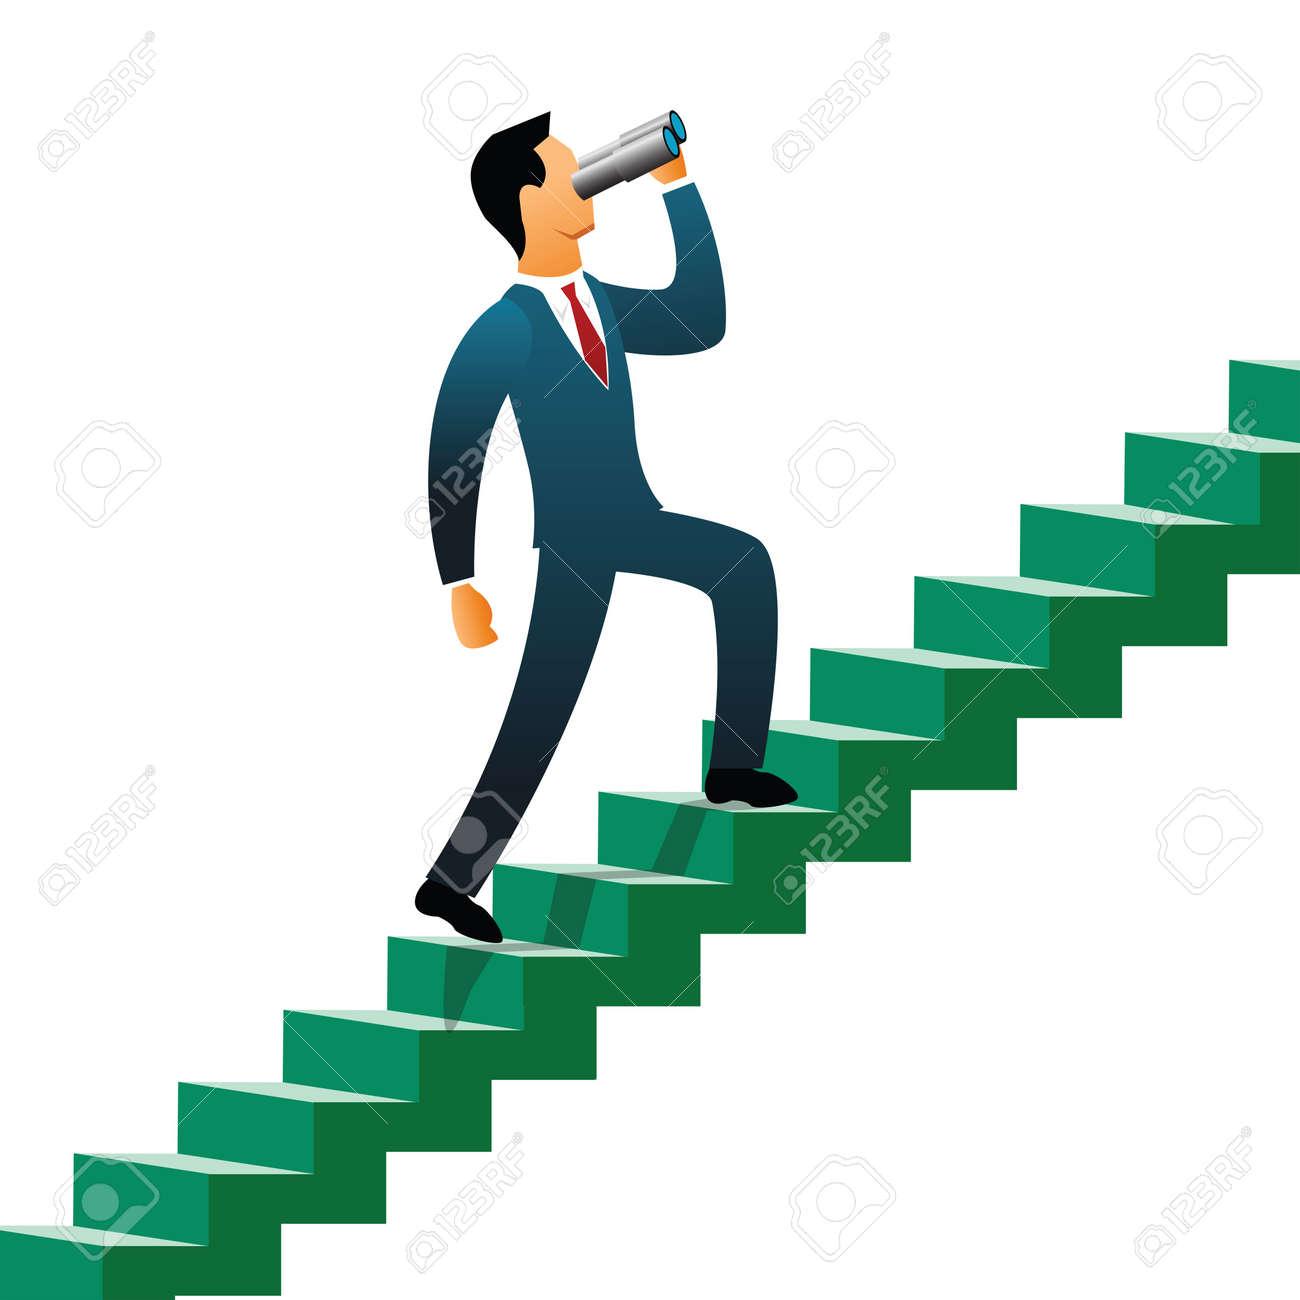 Businessmen climbing up steps Stock Photo - 9688280